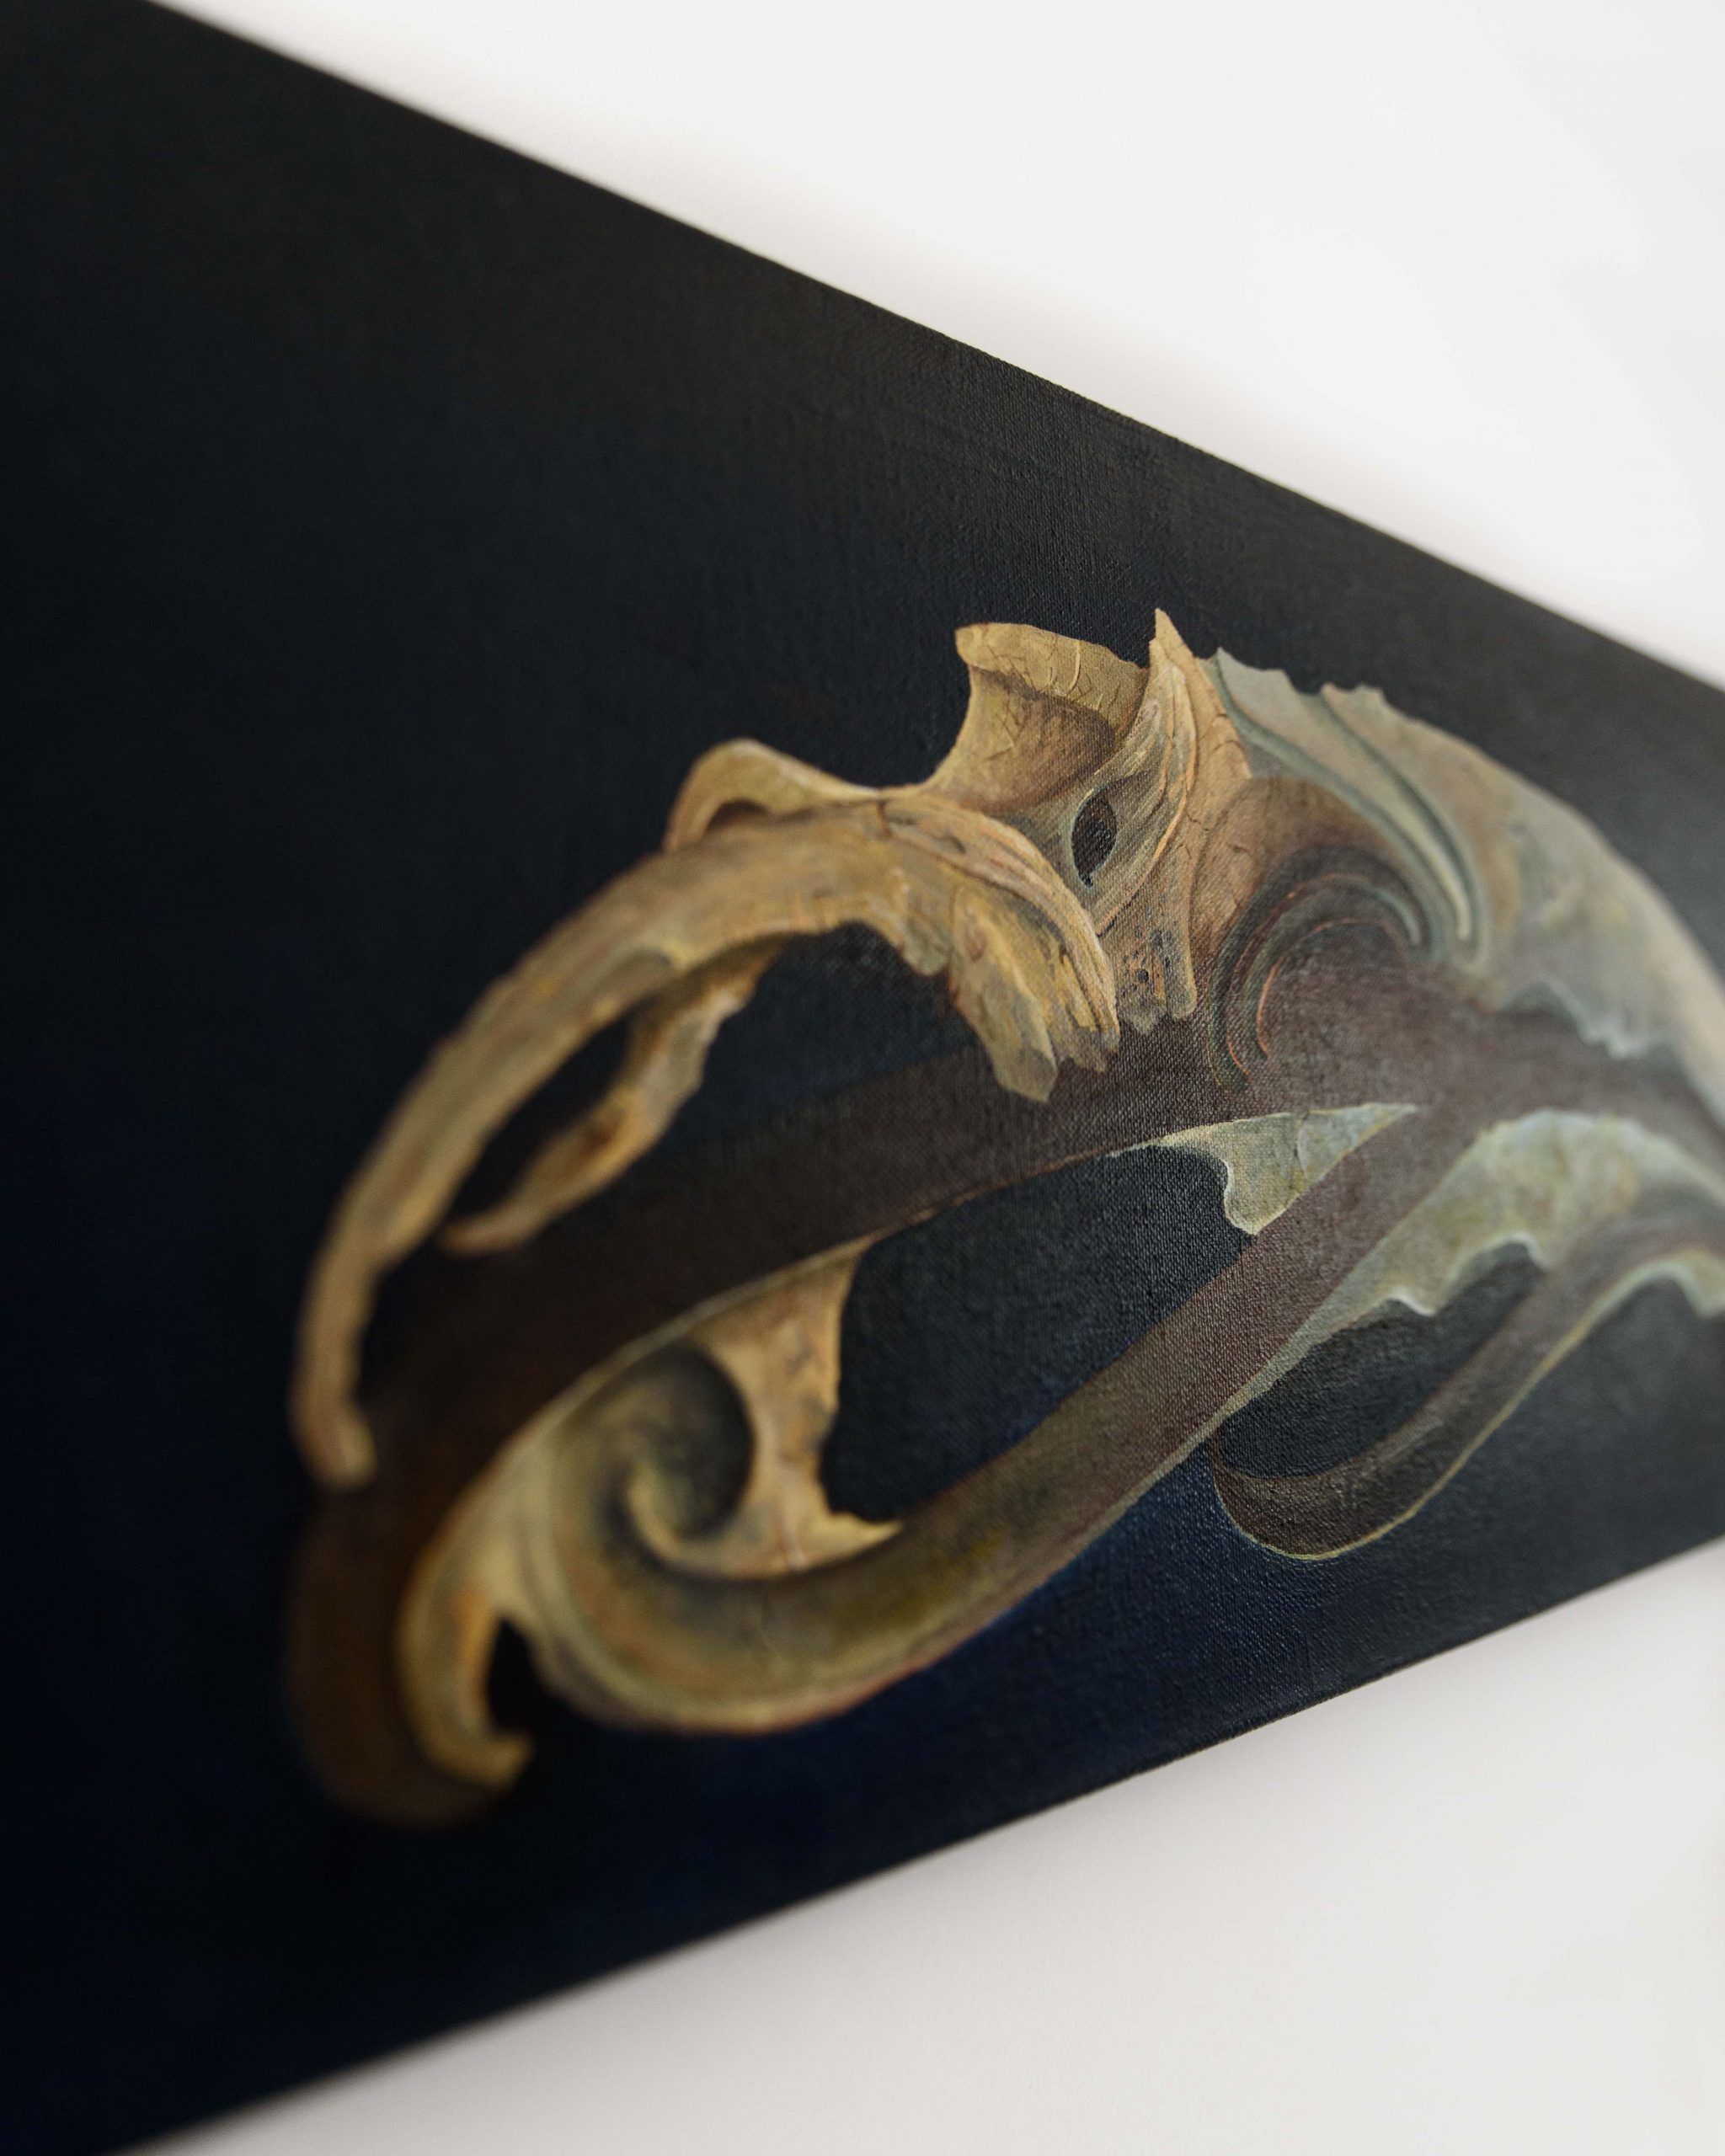 Kimura Hyde Product Image